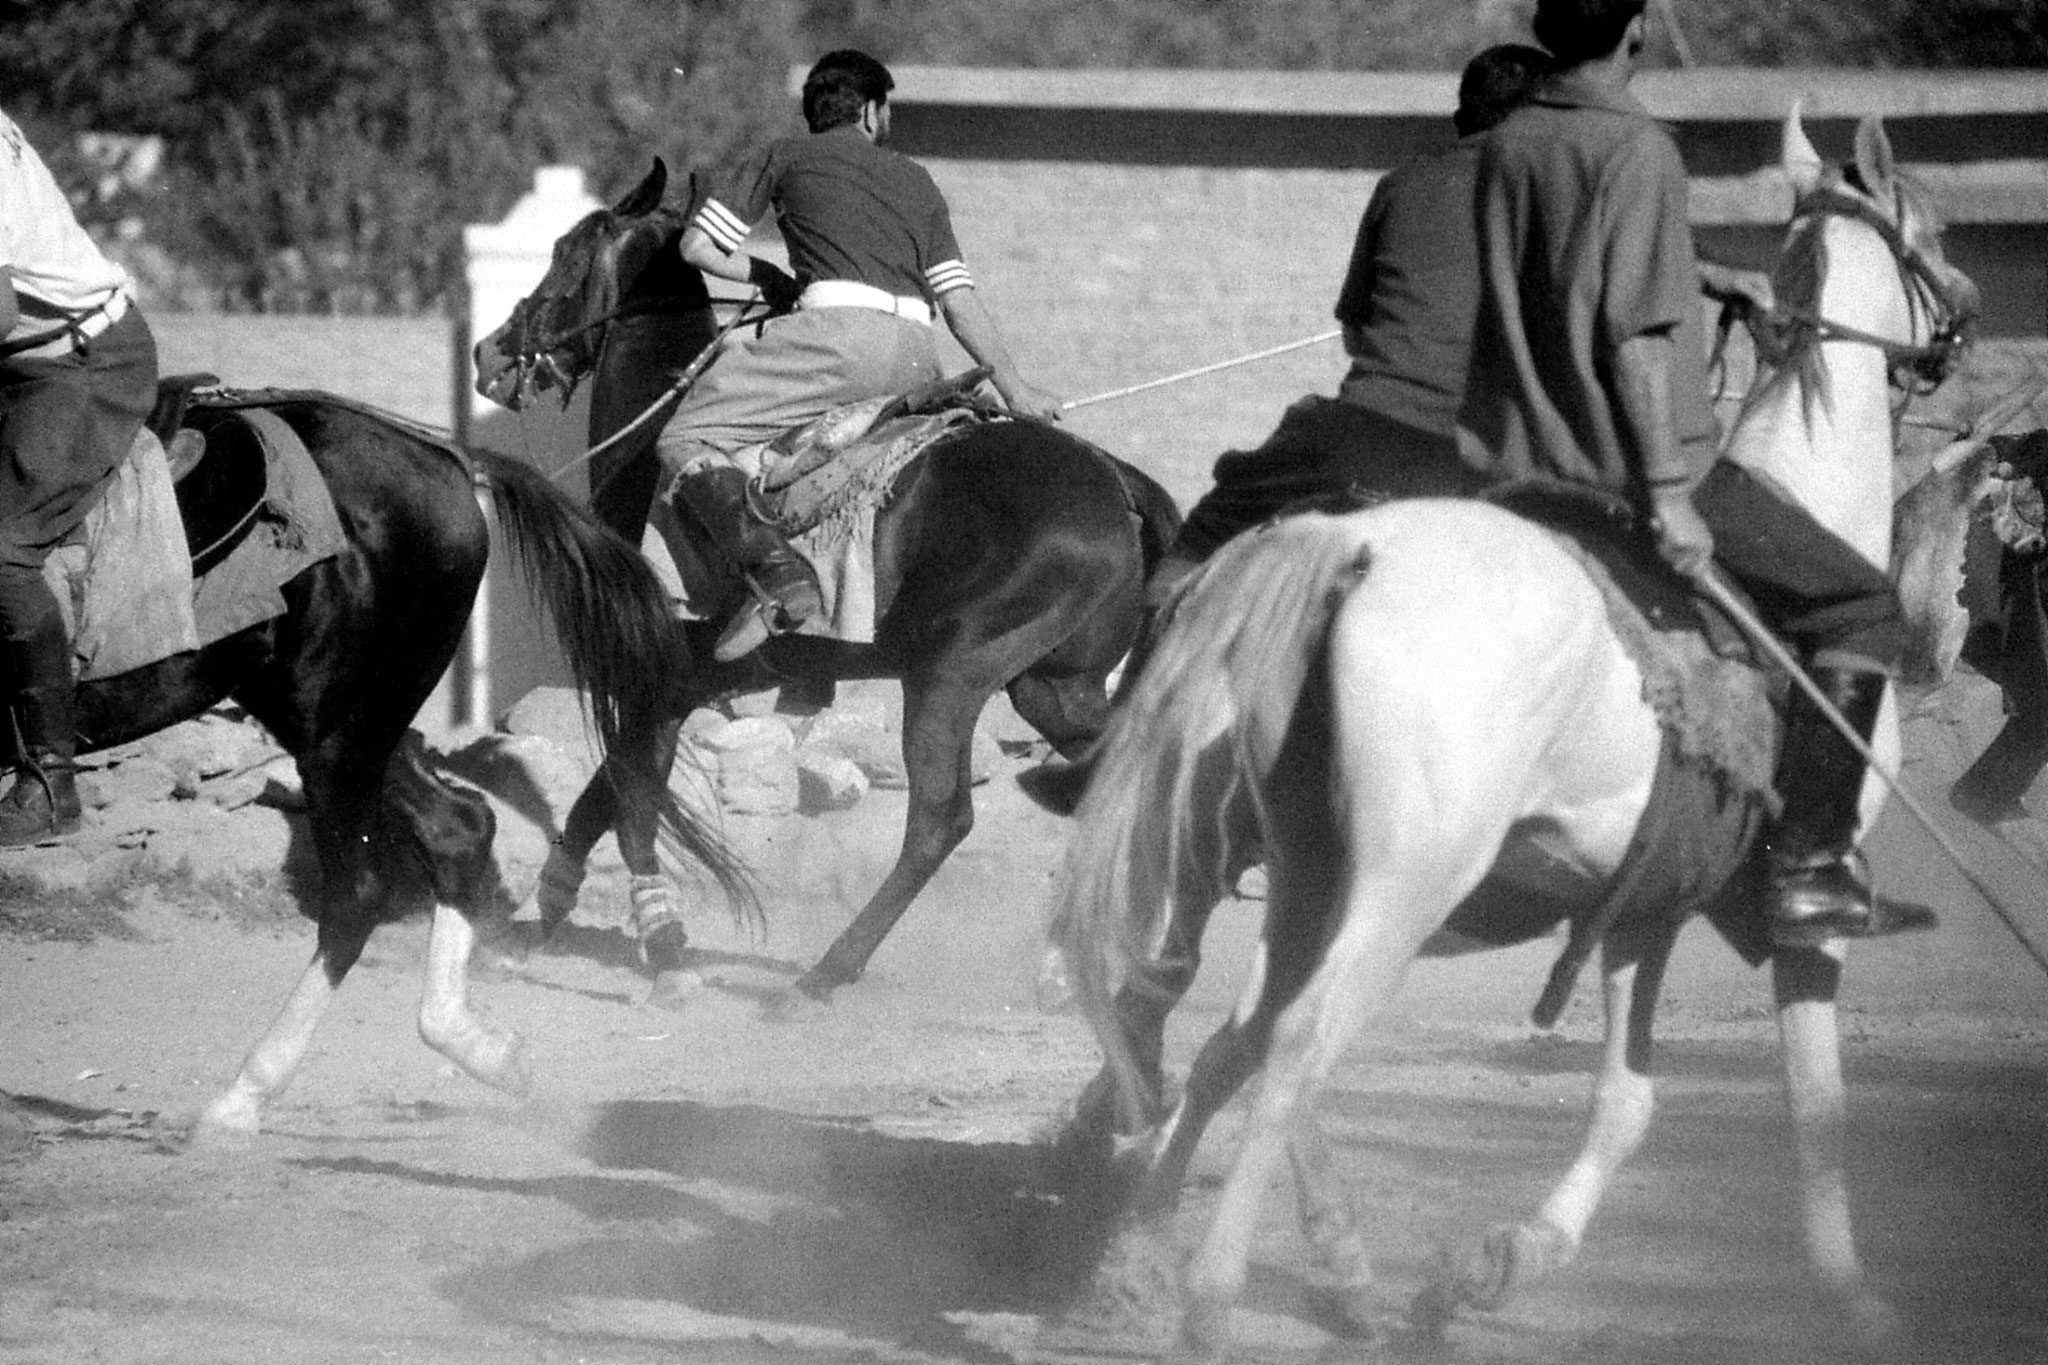 9/10/1989: 1: Gilgit polo match